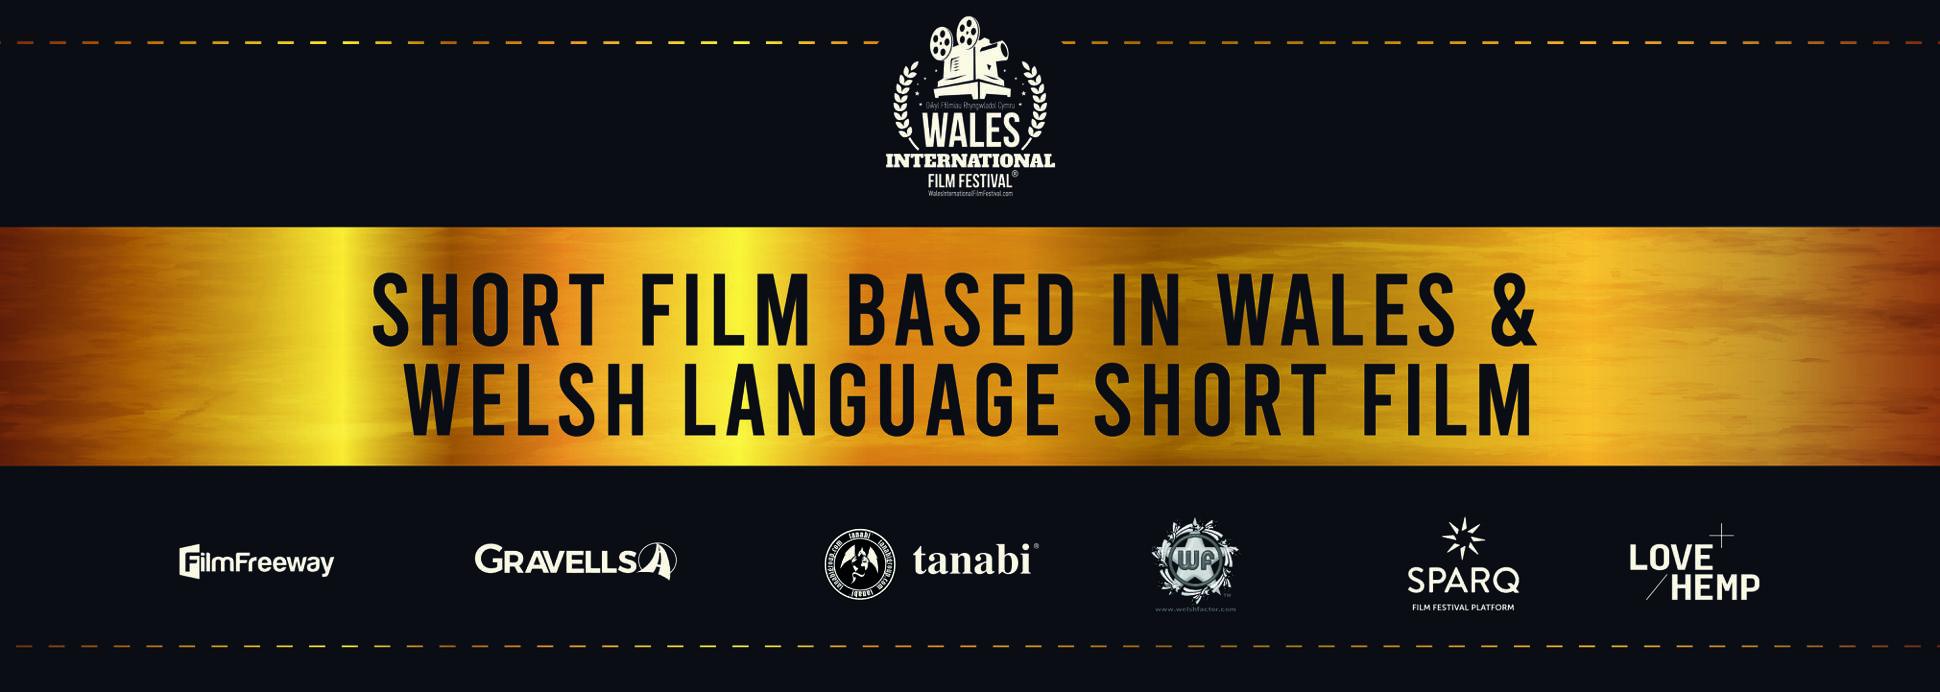 Short Film Based in Wales + Welsh Language